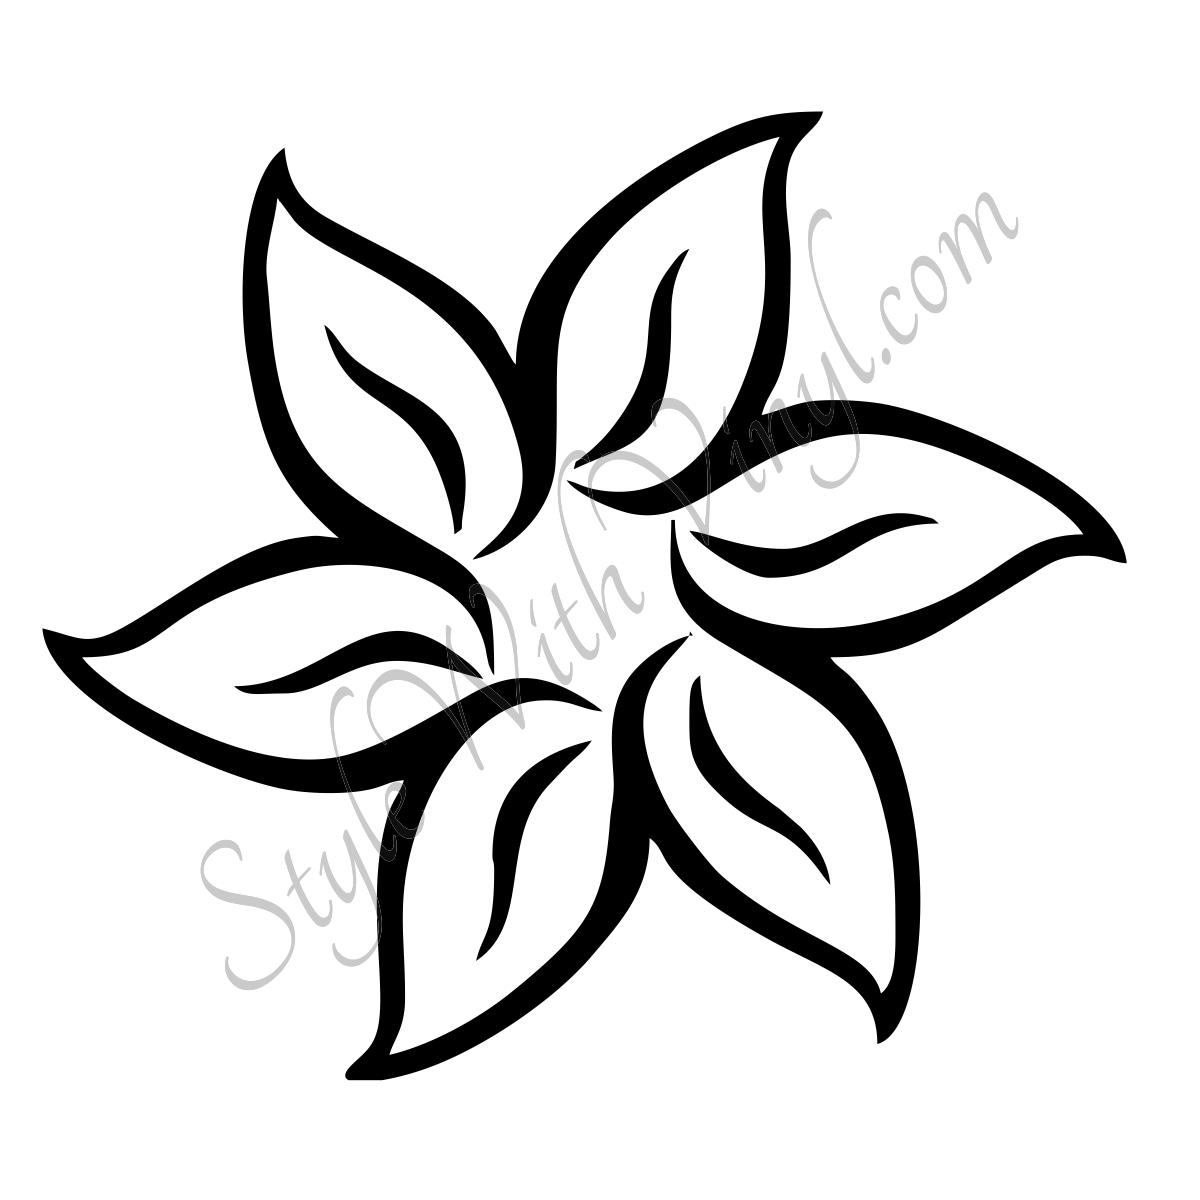 1200x1200 Simple Flower Drawing Ideas Lotus Flower Tattoos